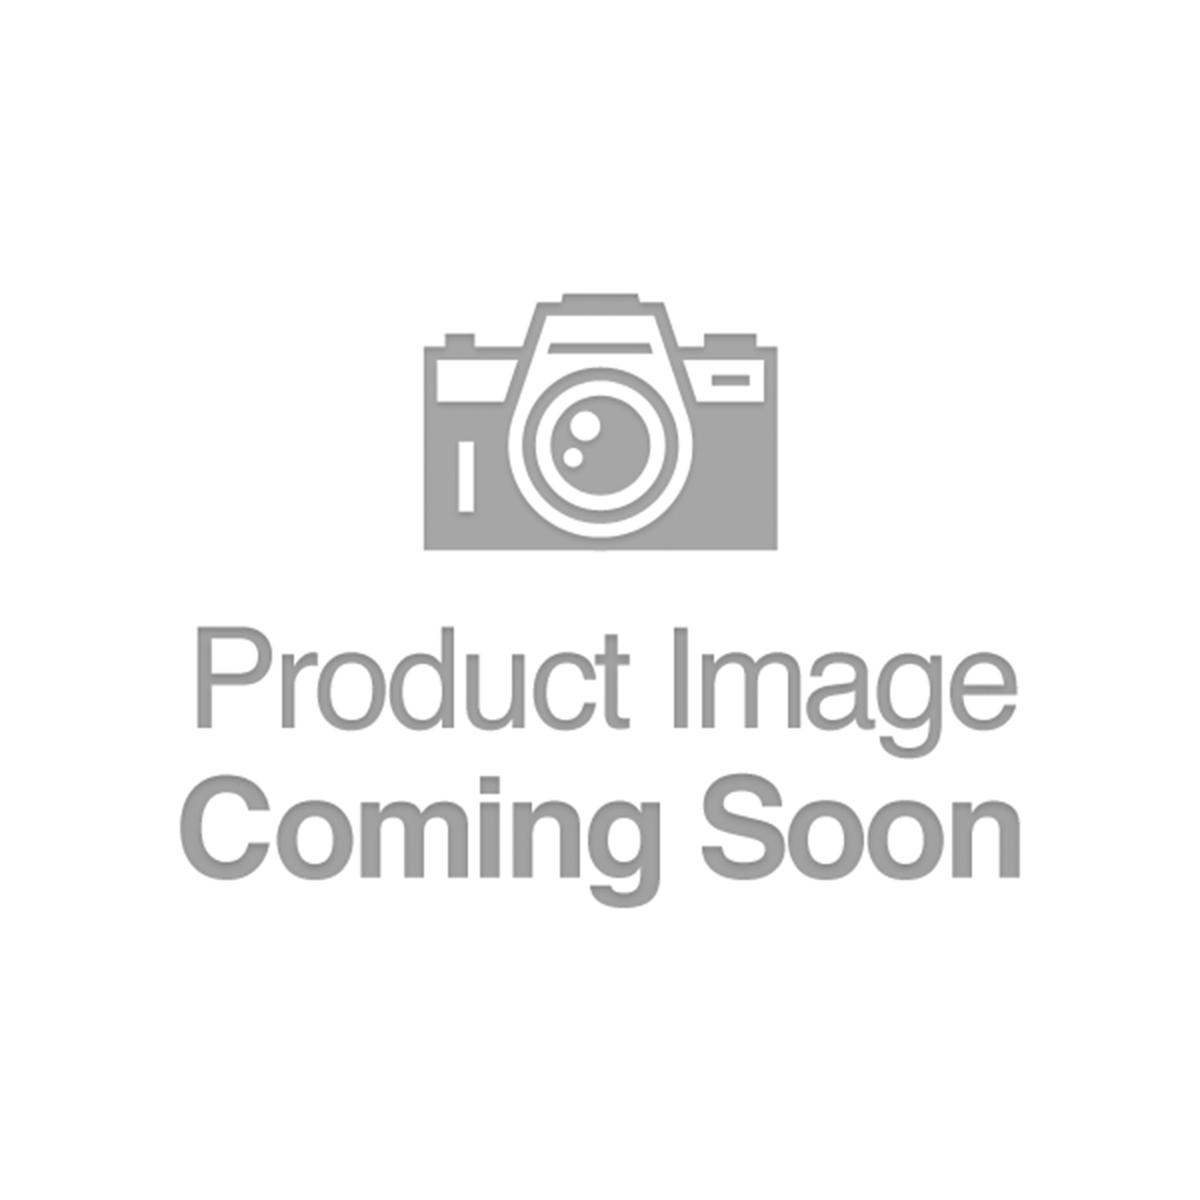 1783 C Nova Blunt Rays Colonials - Nova Constellatio Coins PCGS F12BN